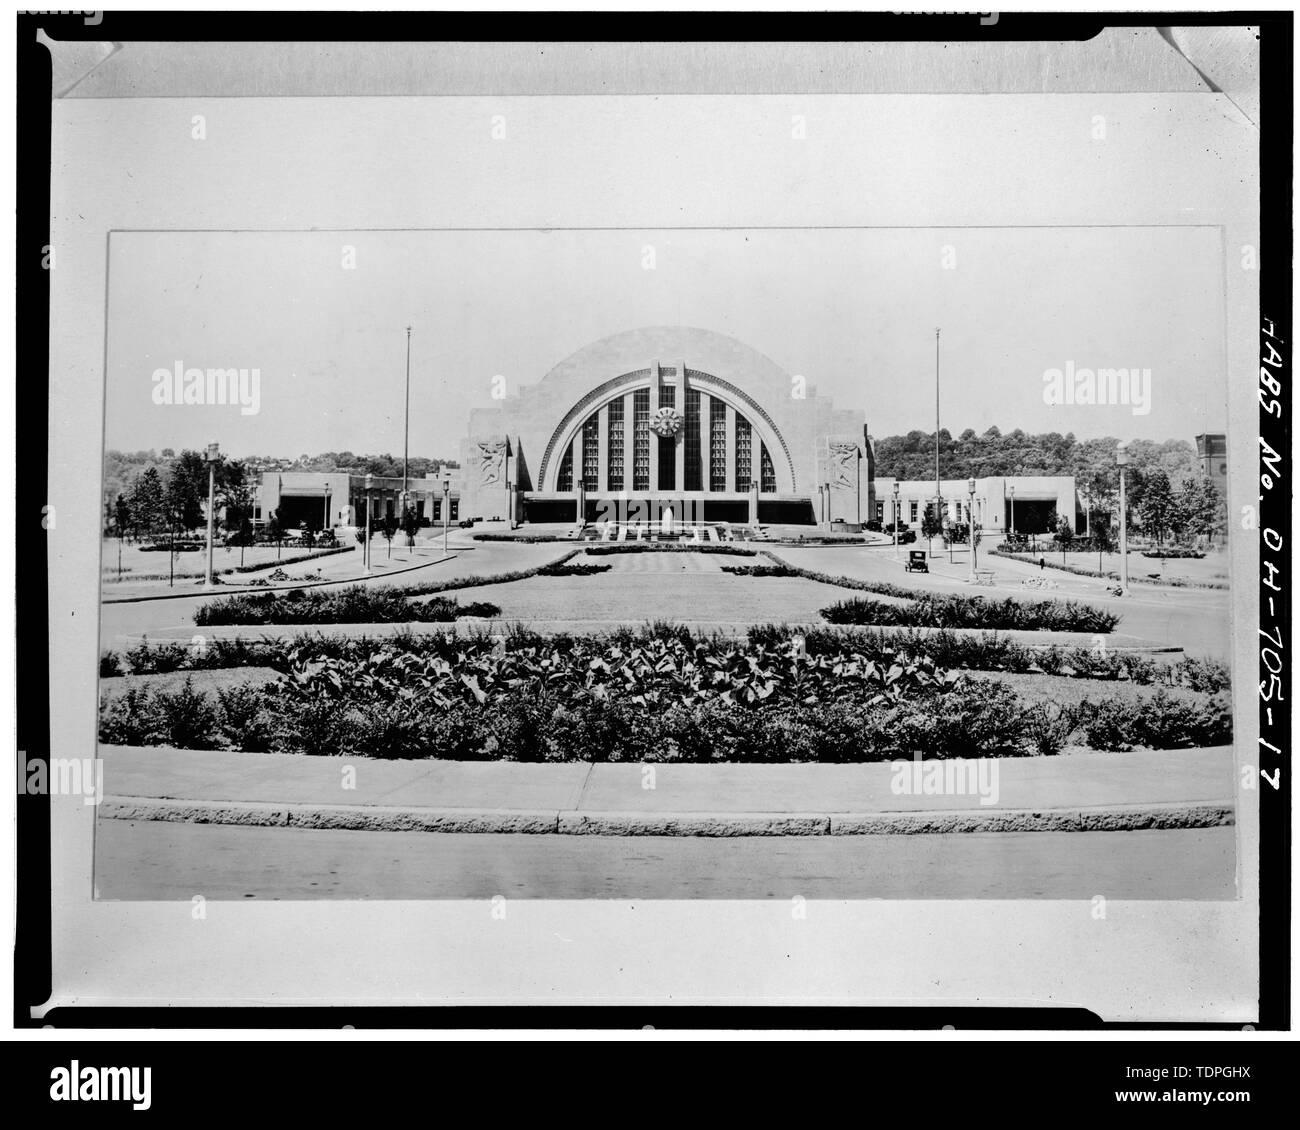 DISTANT VIEW, LOOKING WEST - Cincinnati Union Terminal, 1301 Western Avenue, Cincinnati, Hamilton County, OH - Stock Image